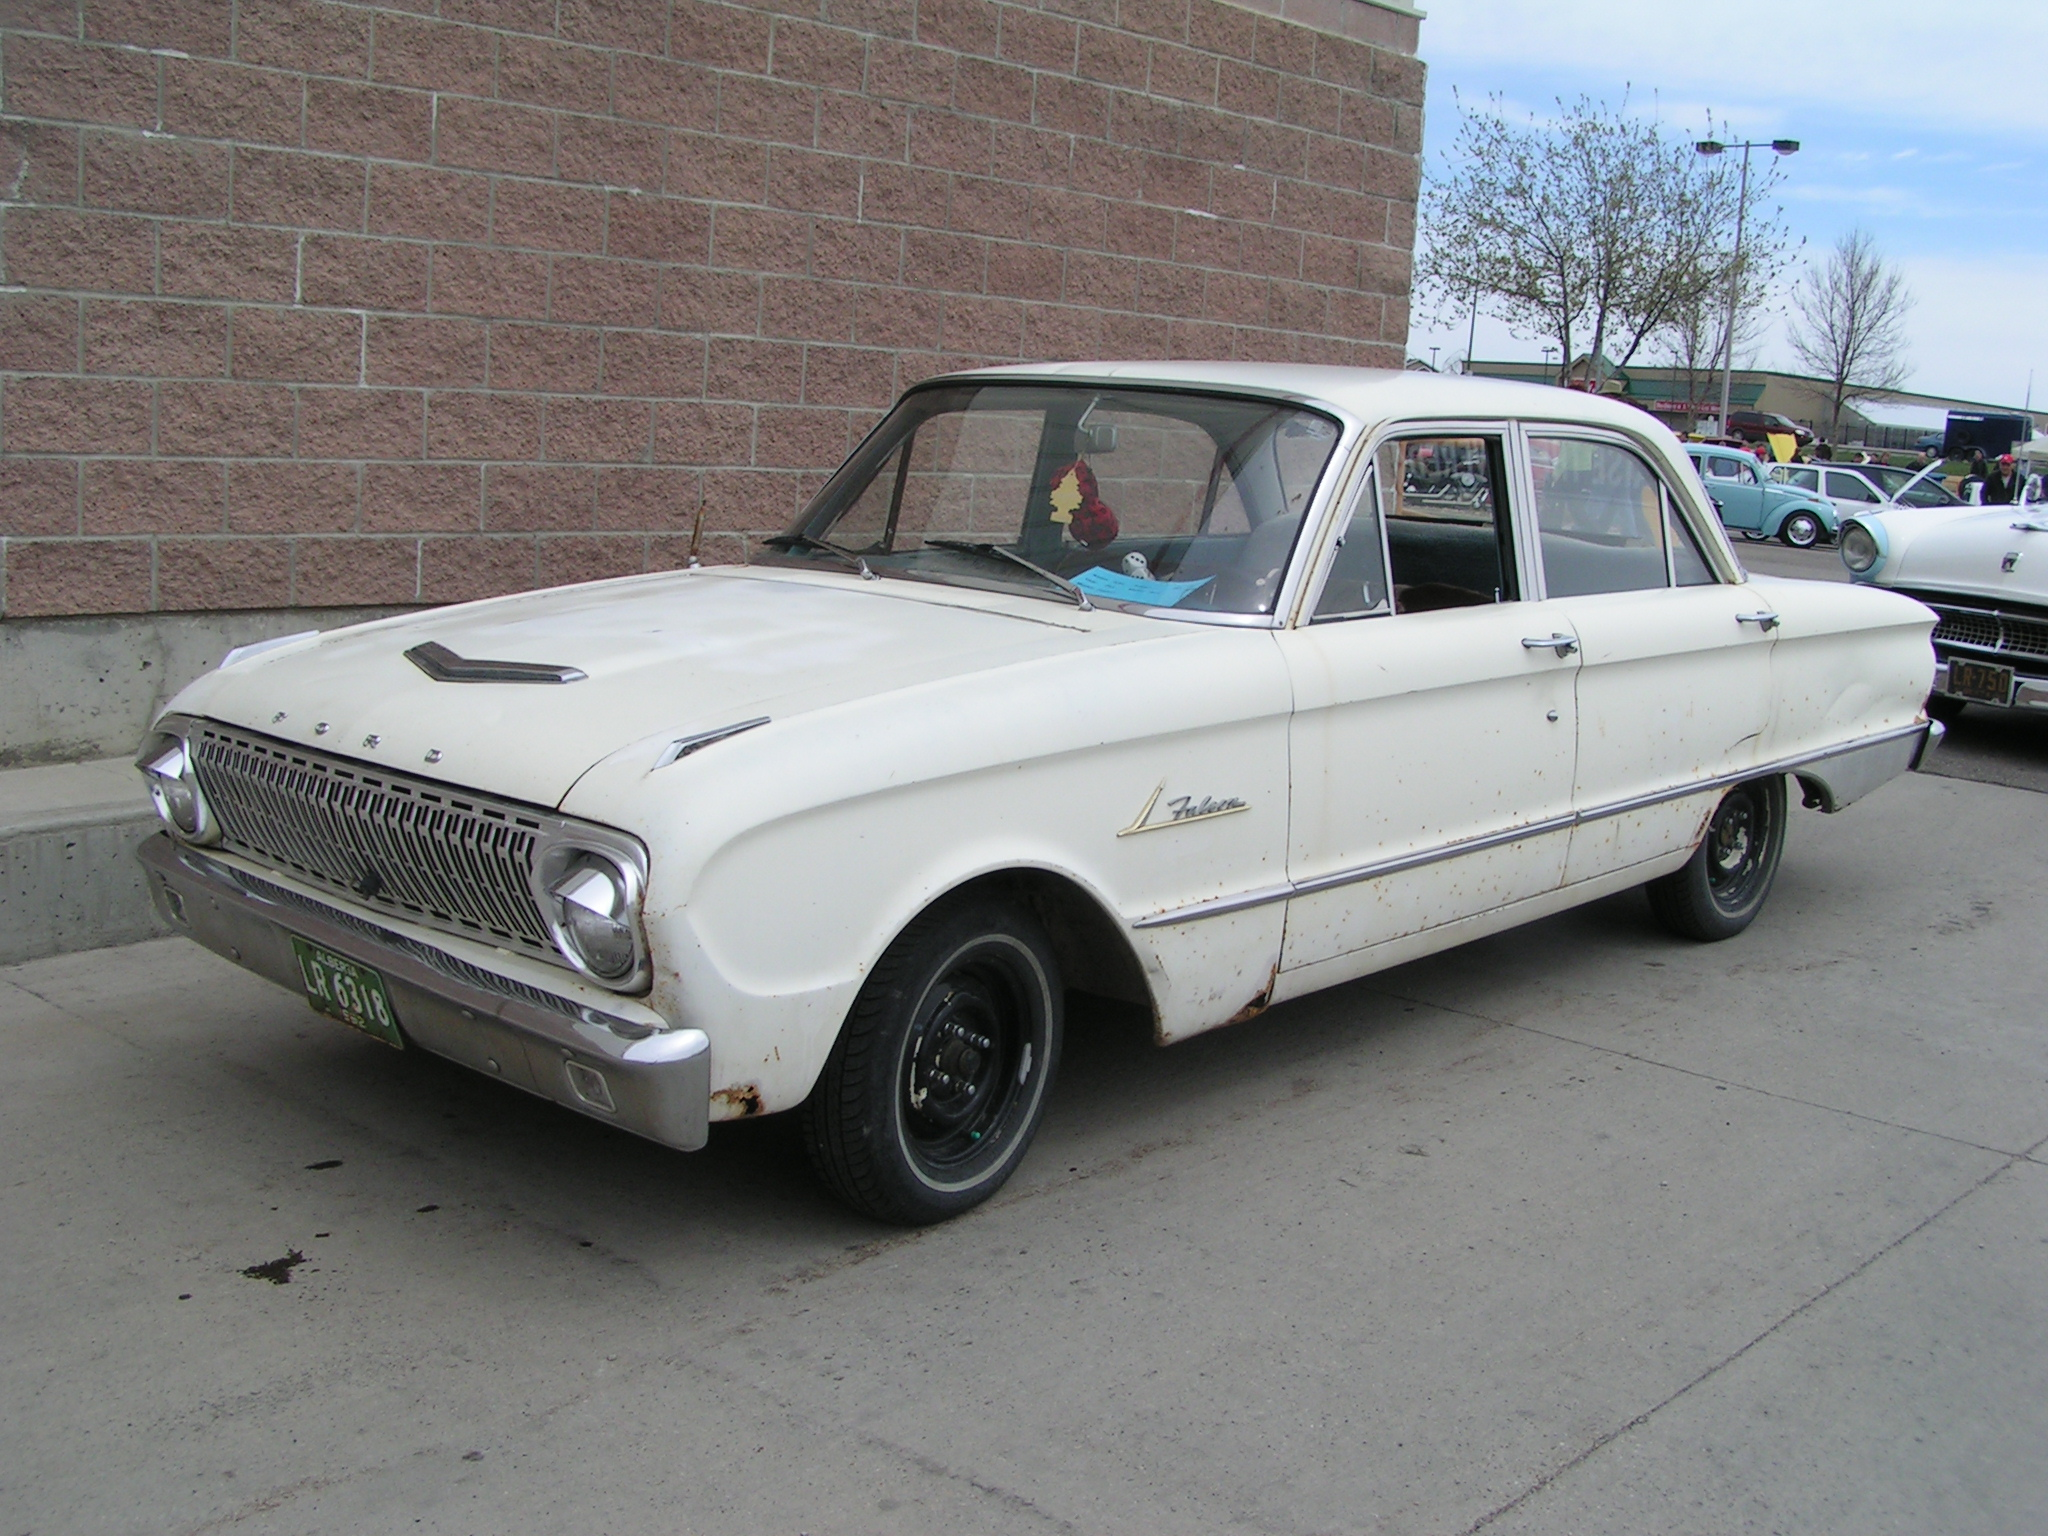 File:1963 Ford Falcon (2482185218) jpg - Wikimedia Commons